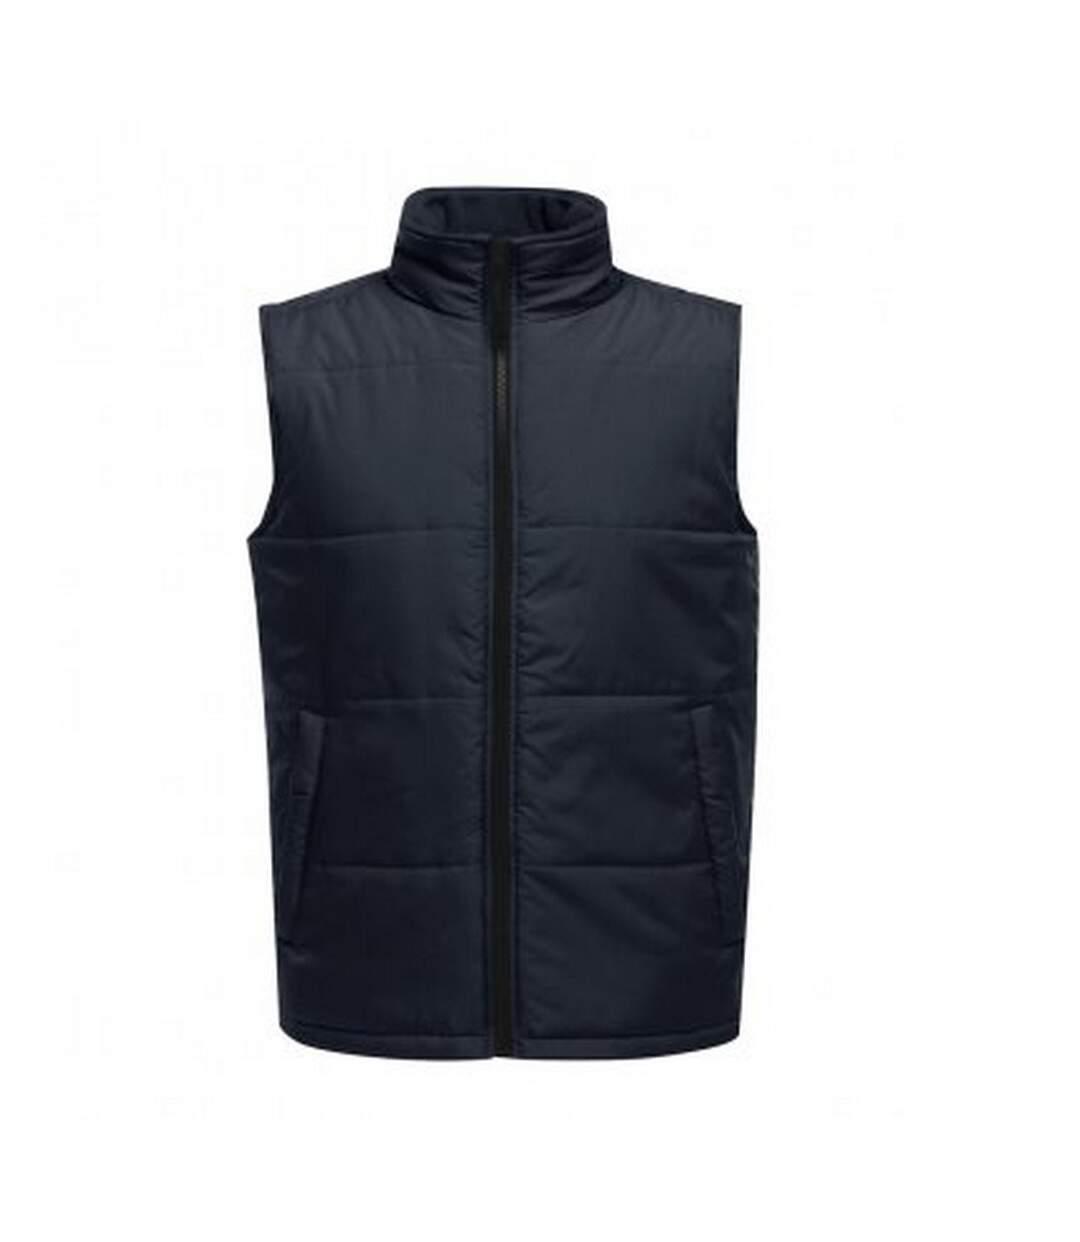 Regatta Standout Mens Access Insulated Bodywarmer (Navy/Black) - UTPC3323